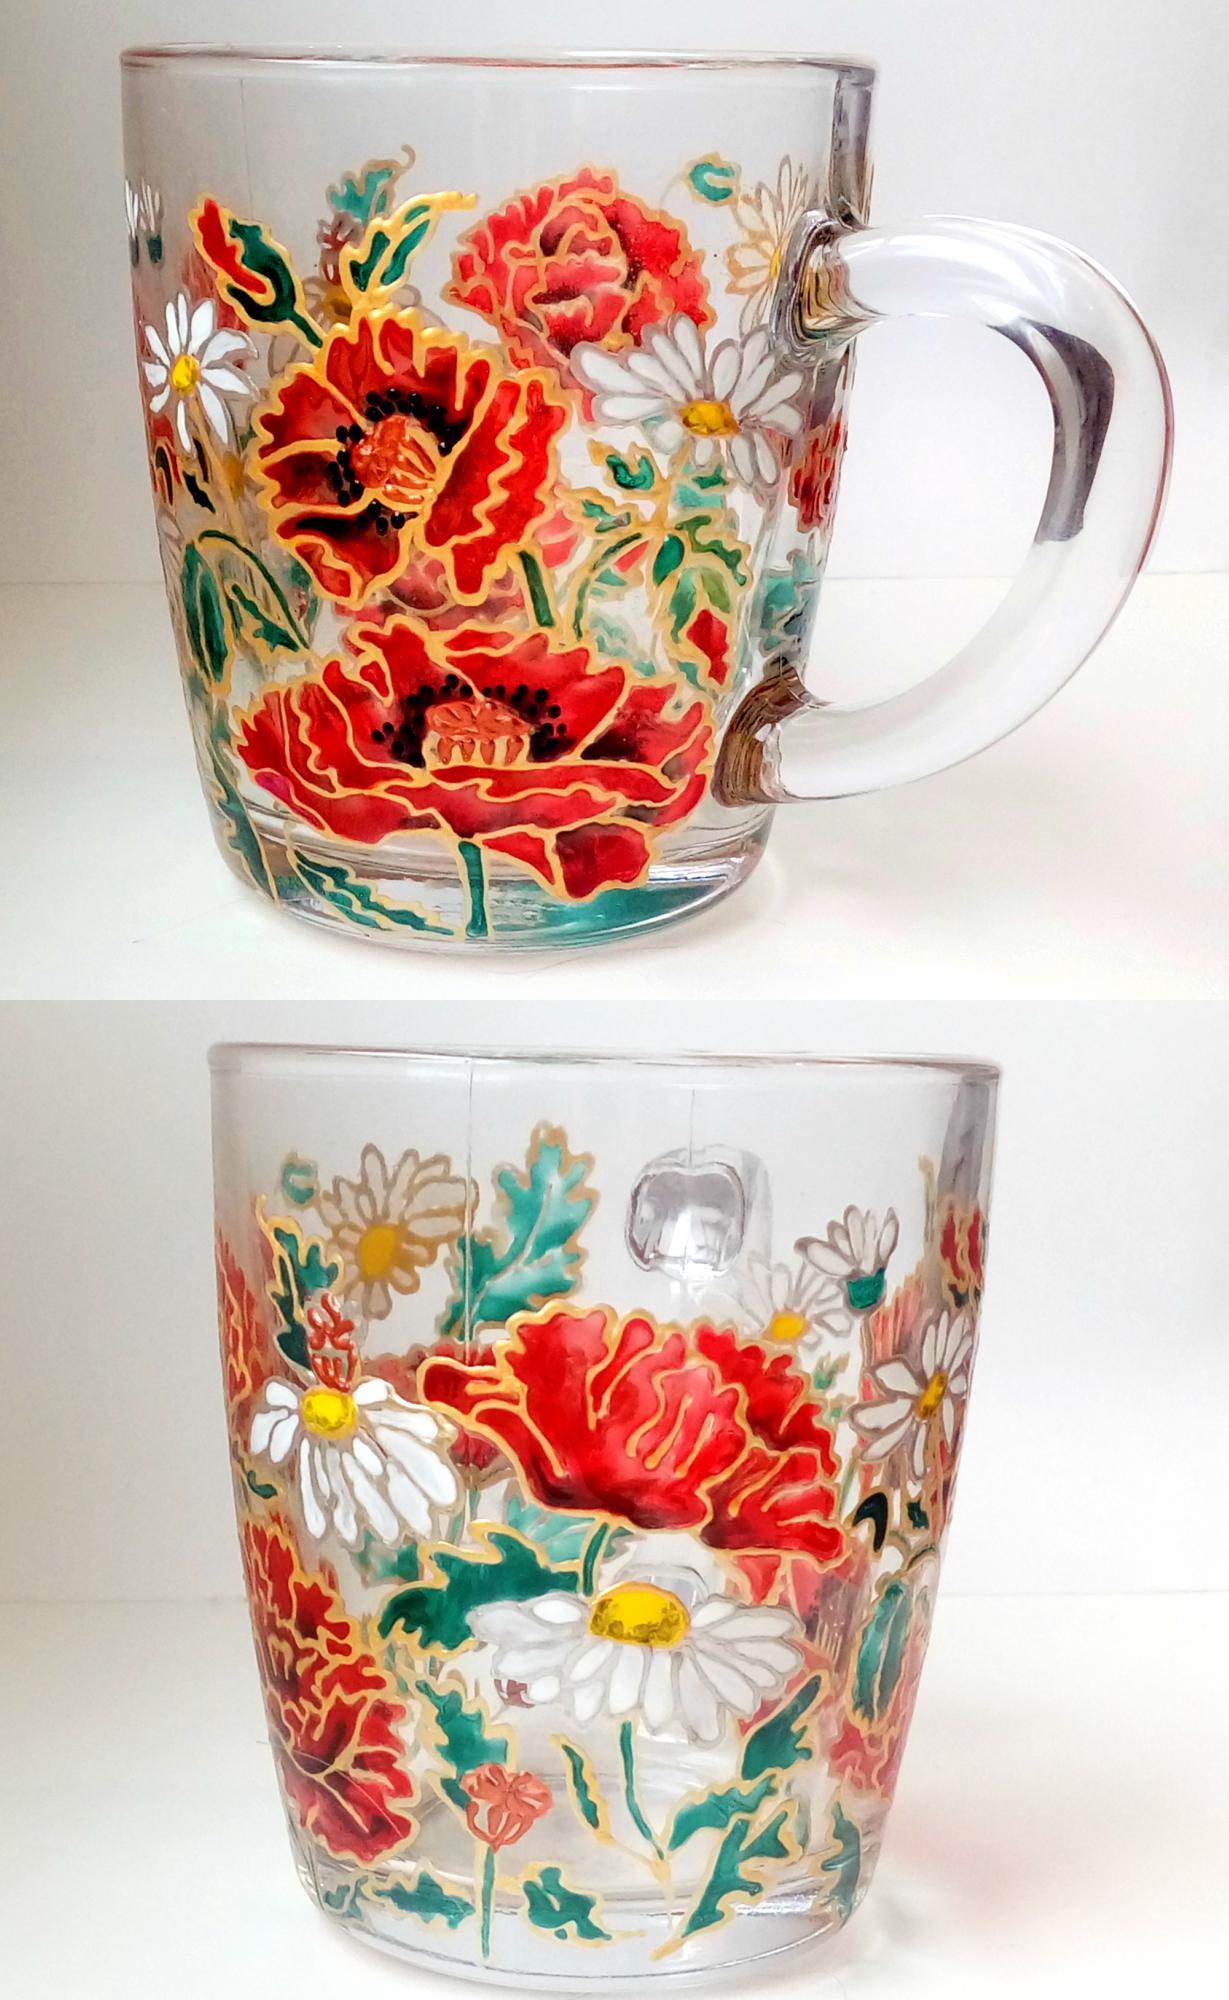 Stained glass coffee mug, personalized custom mug, gift